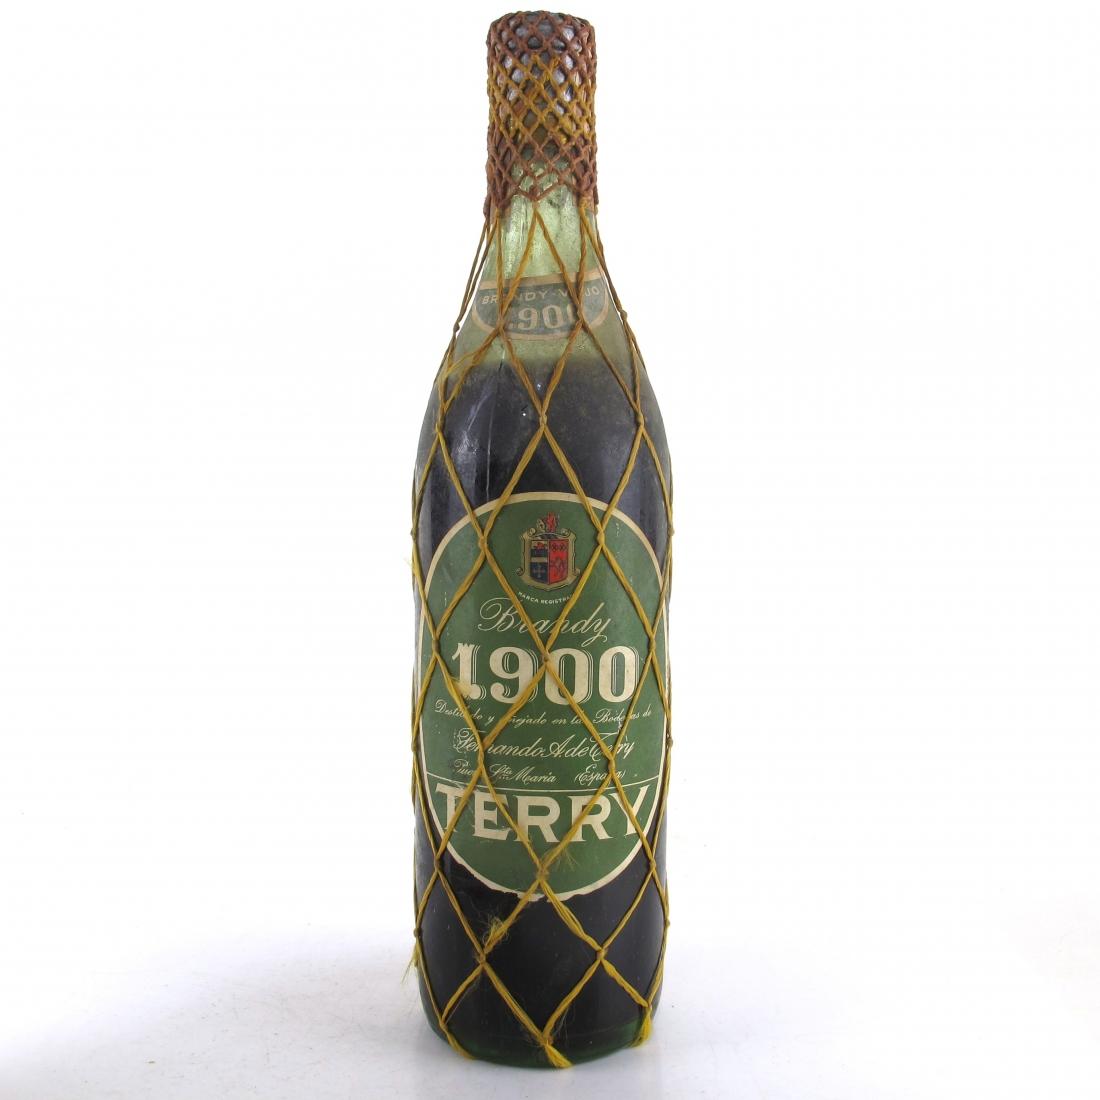 Fernando A. de Terry 1900 Brandy